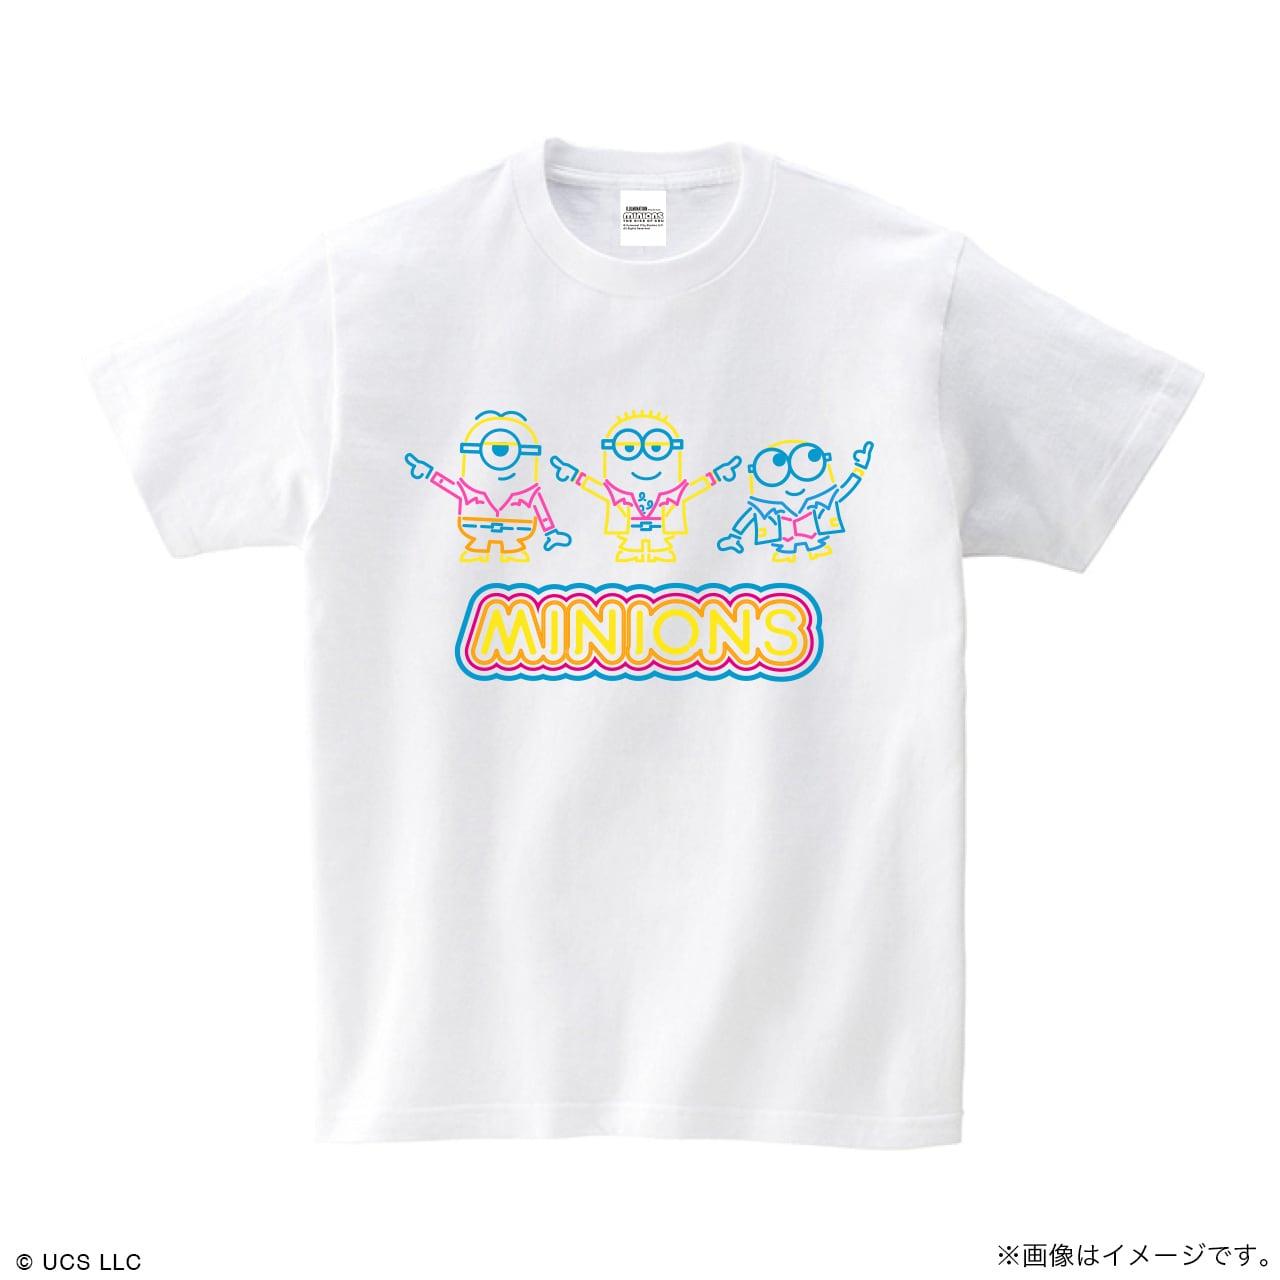 Tシャツ/ミニオン(ネオン ホワイト)【MINIONS POP UP STORE 限定】